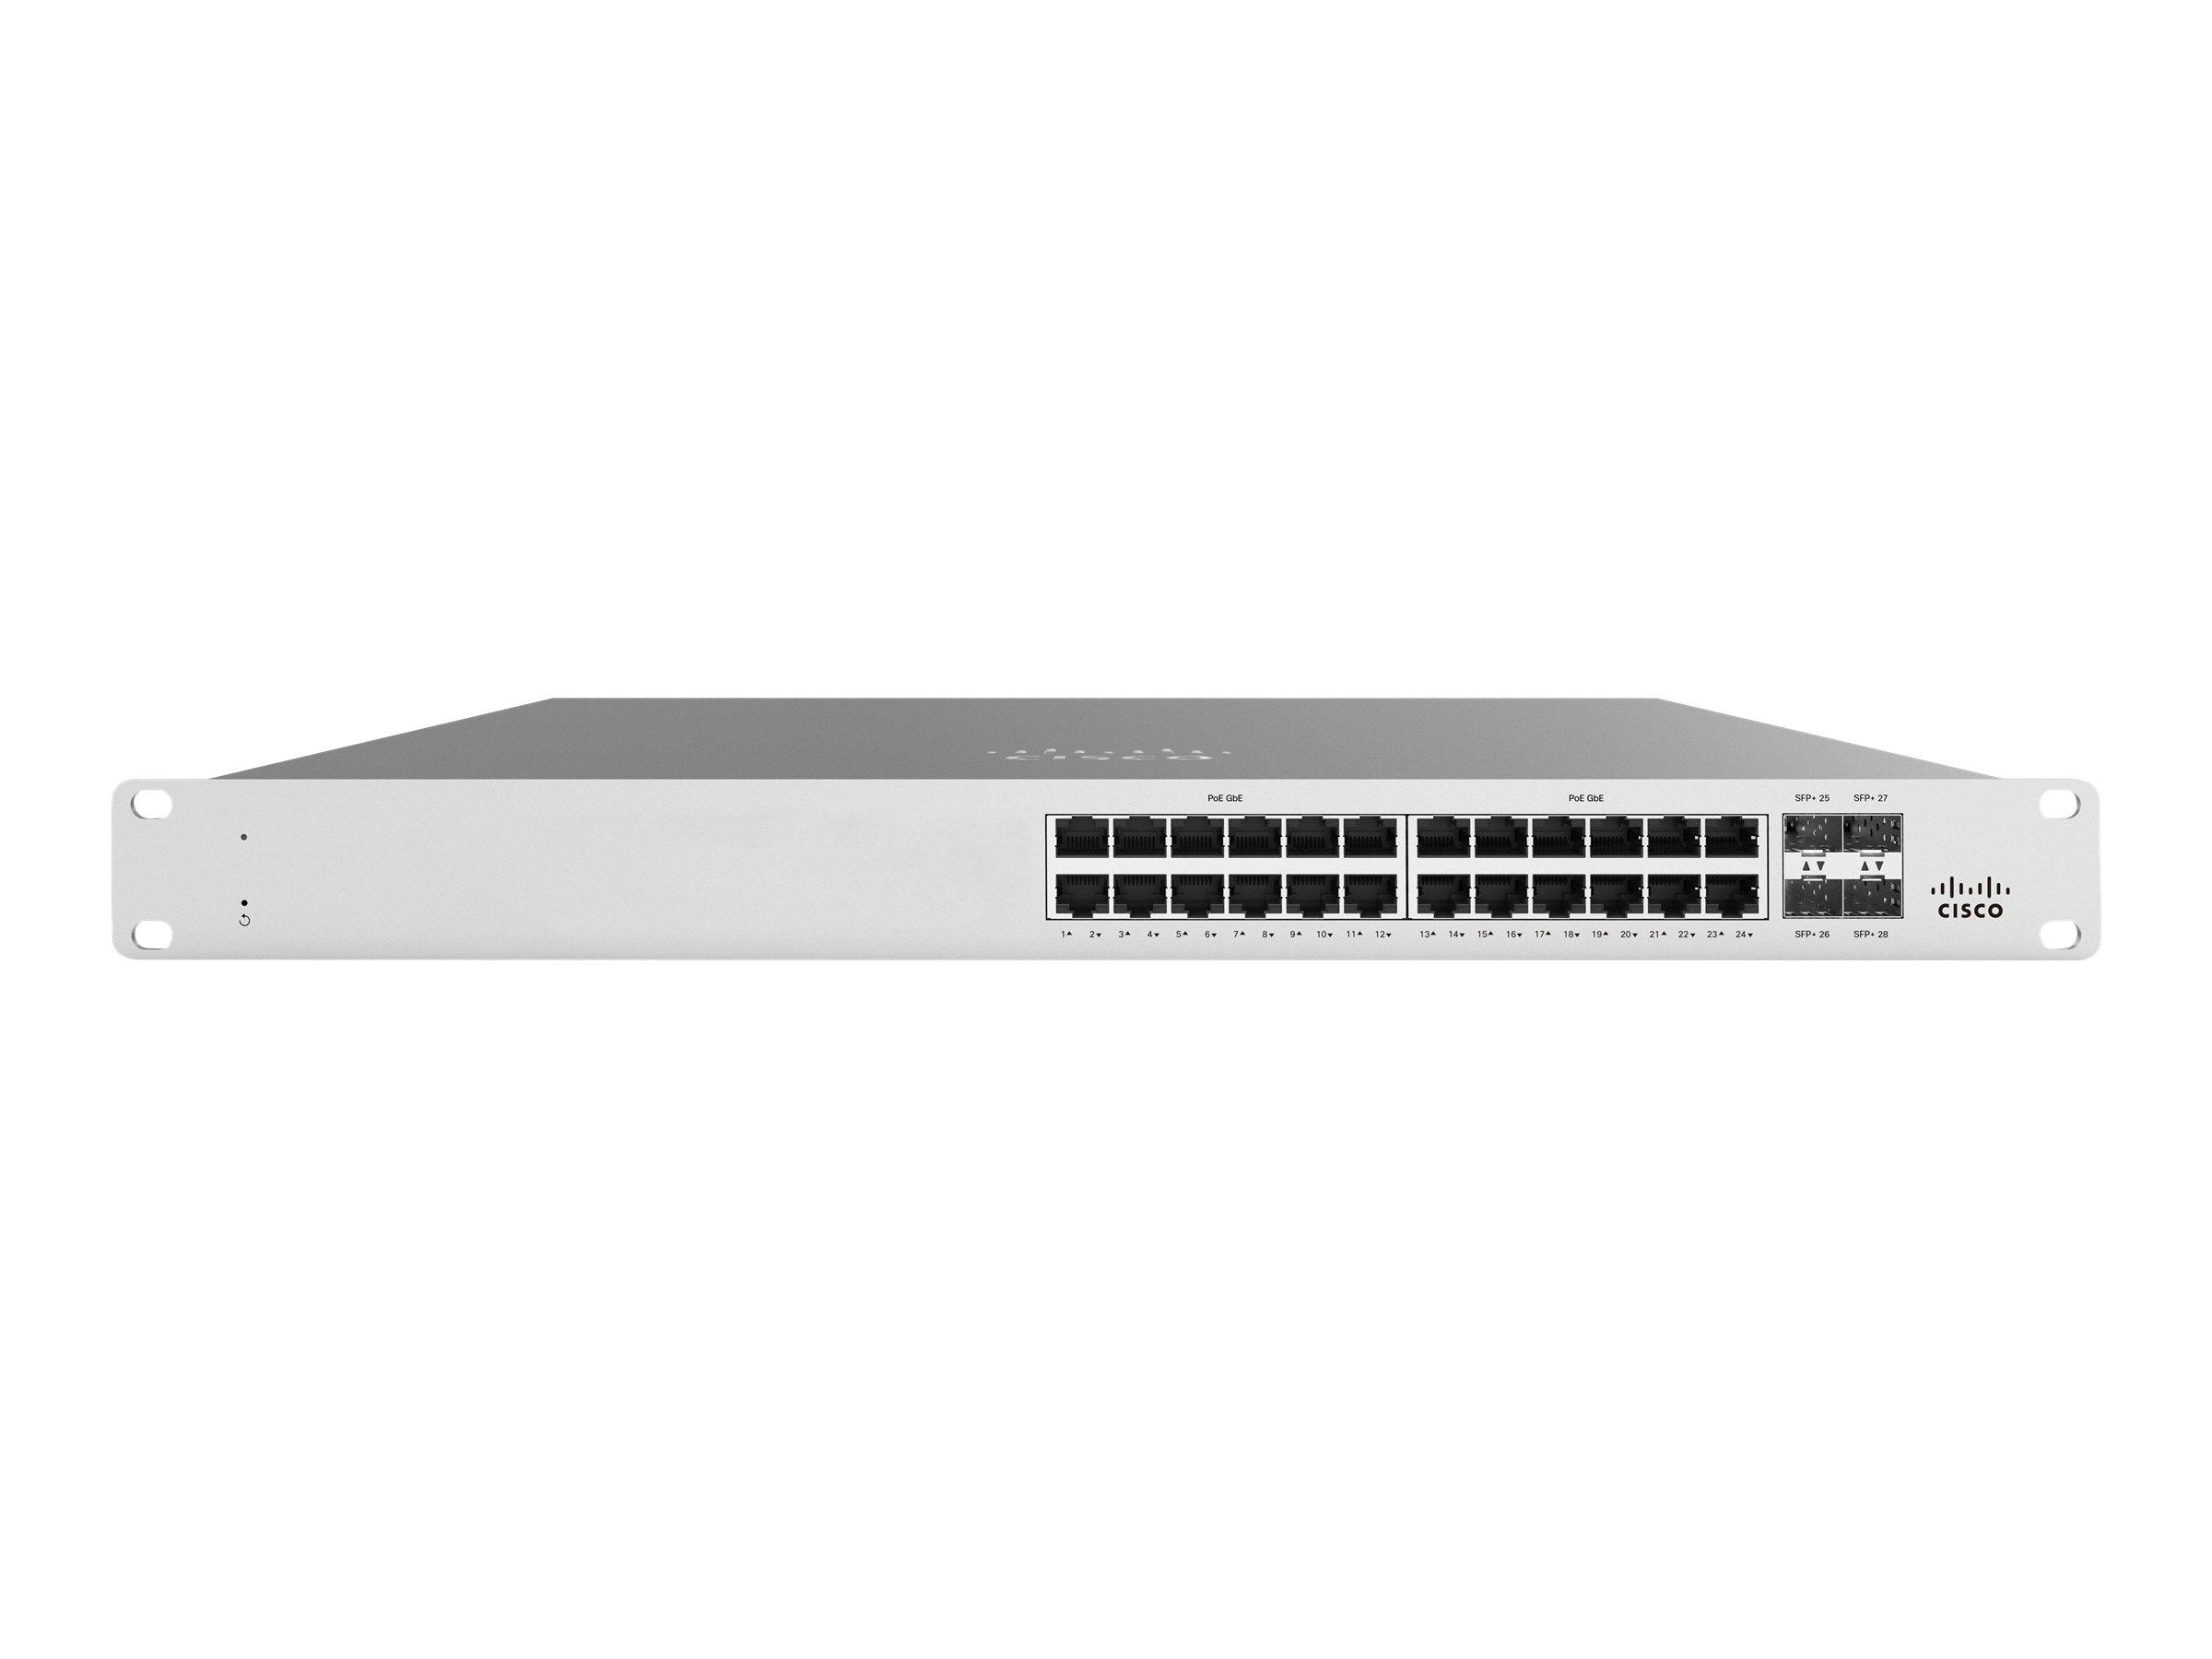 Cisco Meraki Cloud Managed MS125-24P - switch - 24 ports - managed